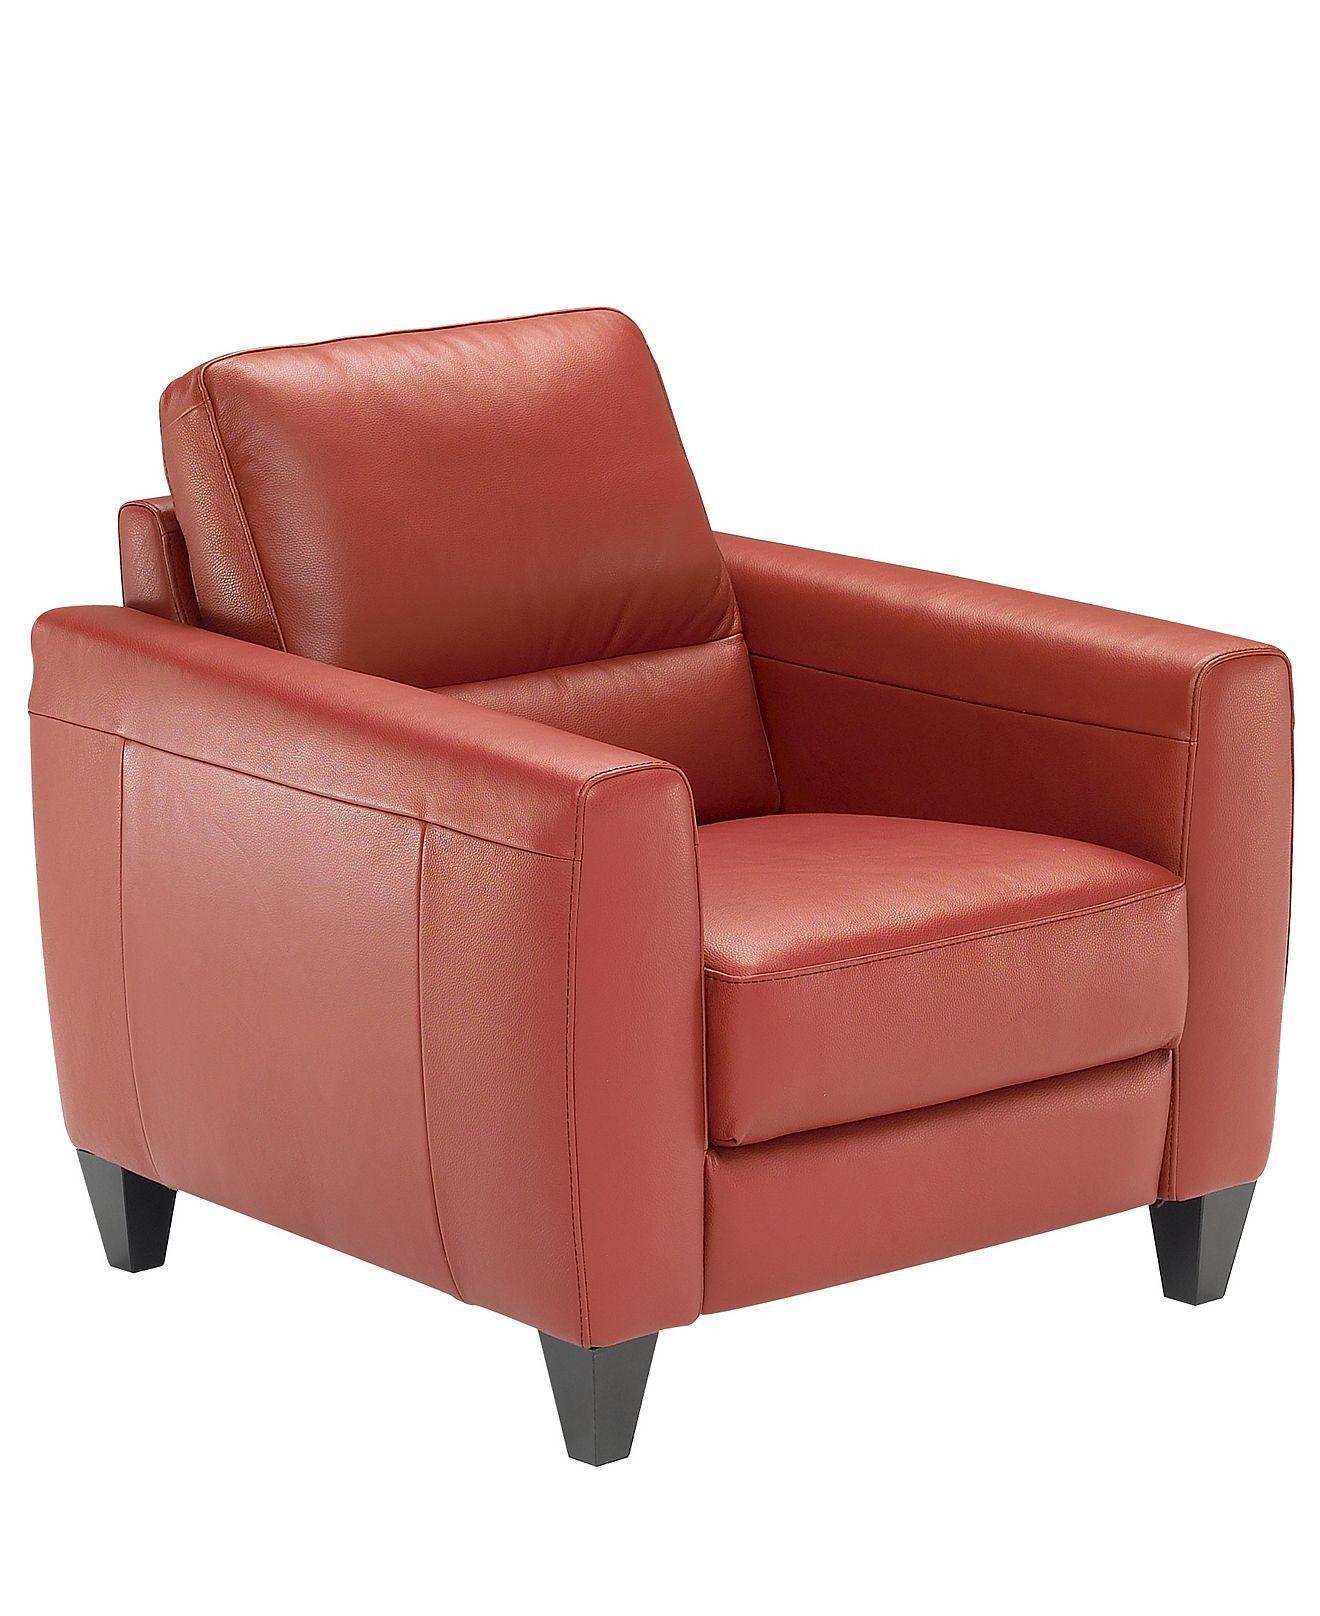 Strange I Want A Recliner That Doesnt Look Like A Recliner Macys Short Links Chair Design For Home Short Linksinfo